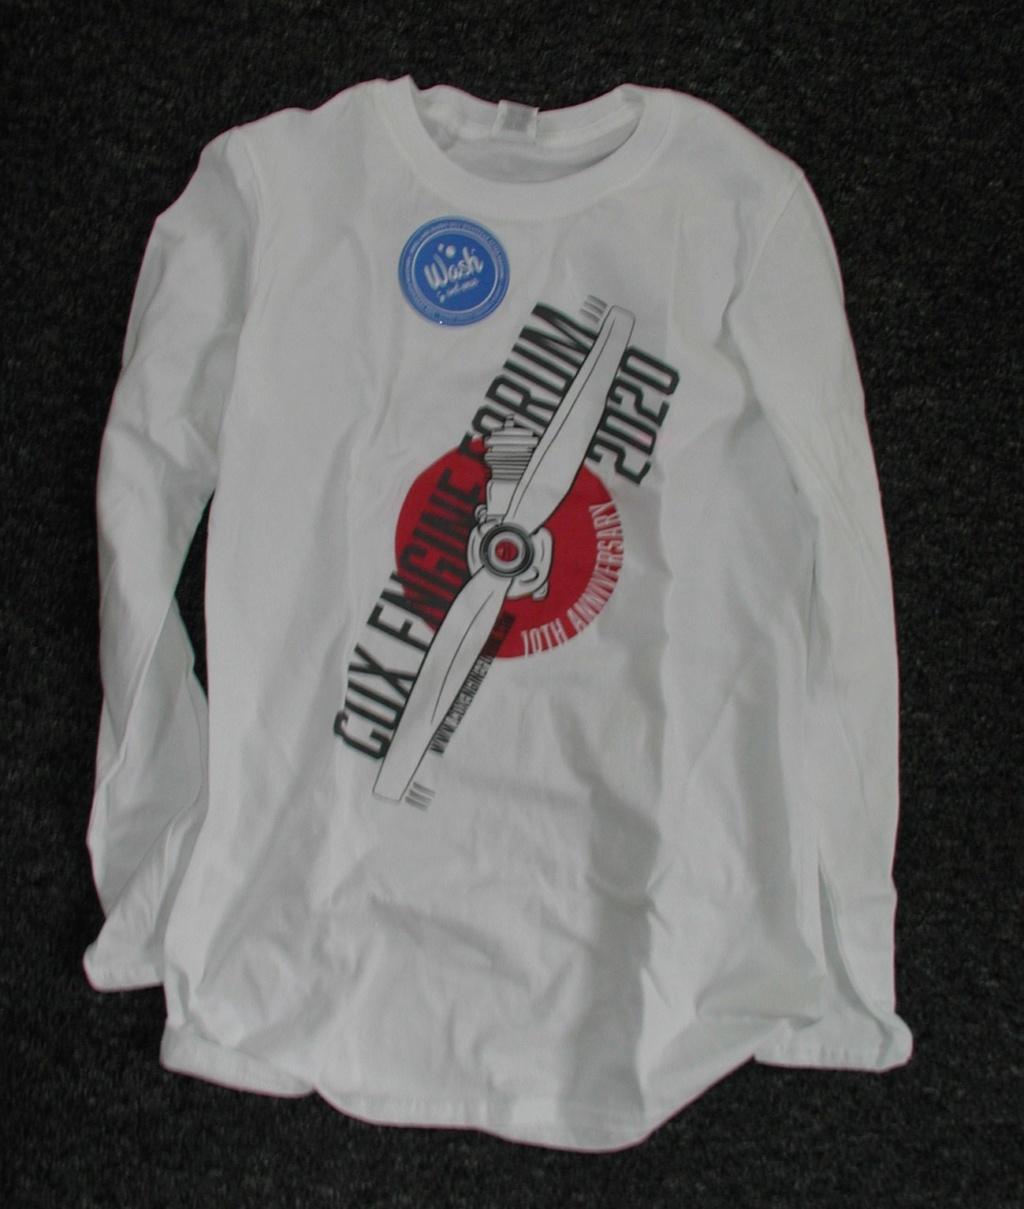 CEF Tee shirt arrives P1010249